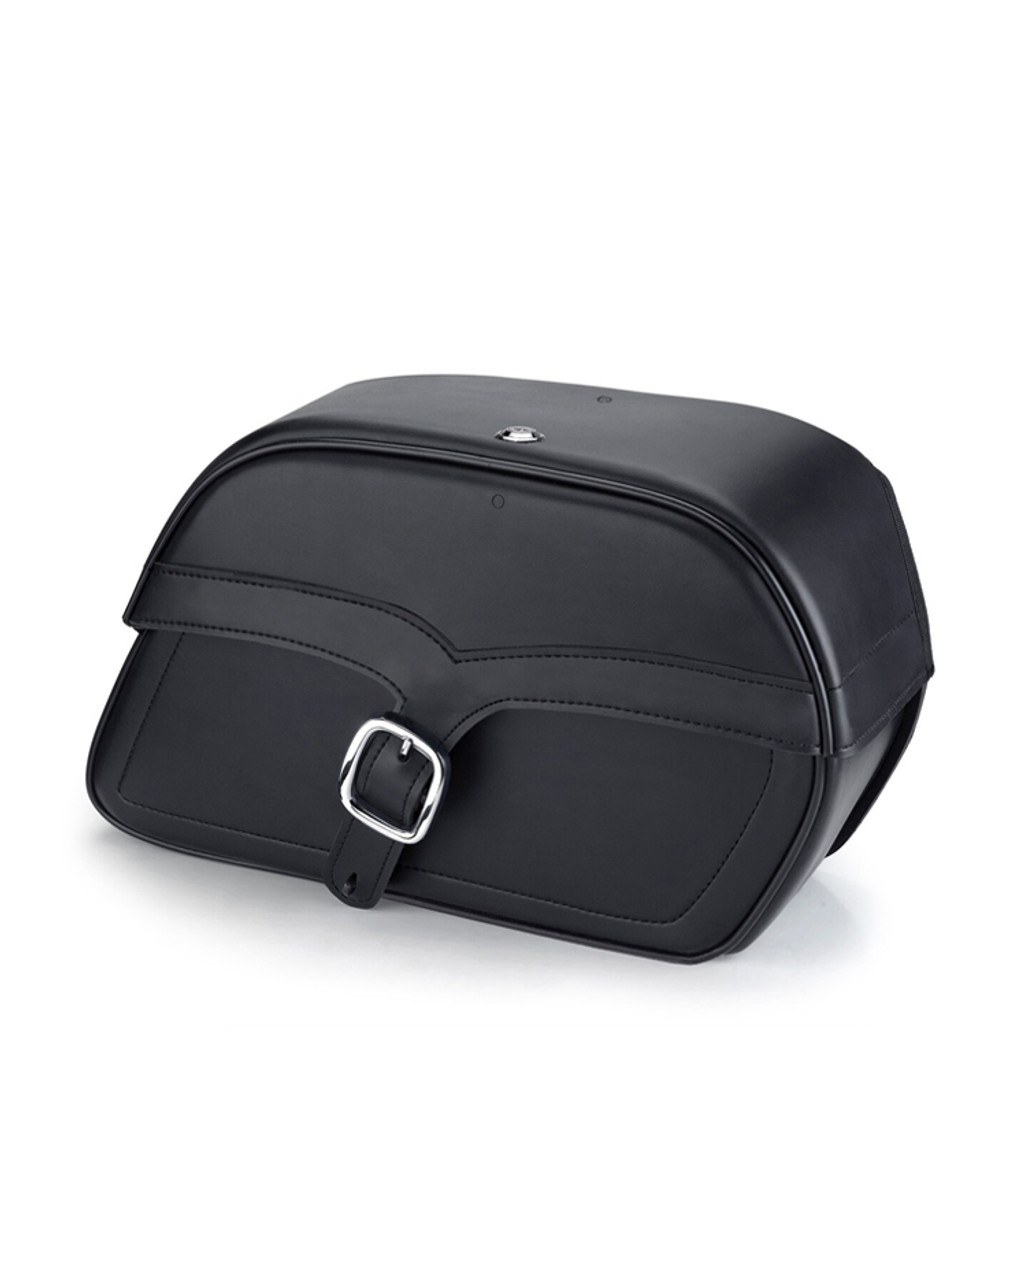 Suzuki Intruder 1500 VL1500 Medium Charger Single Strap Motorcycle Saddlebags Main Bag View